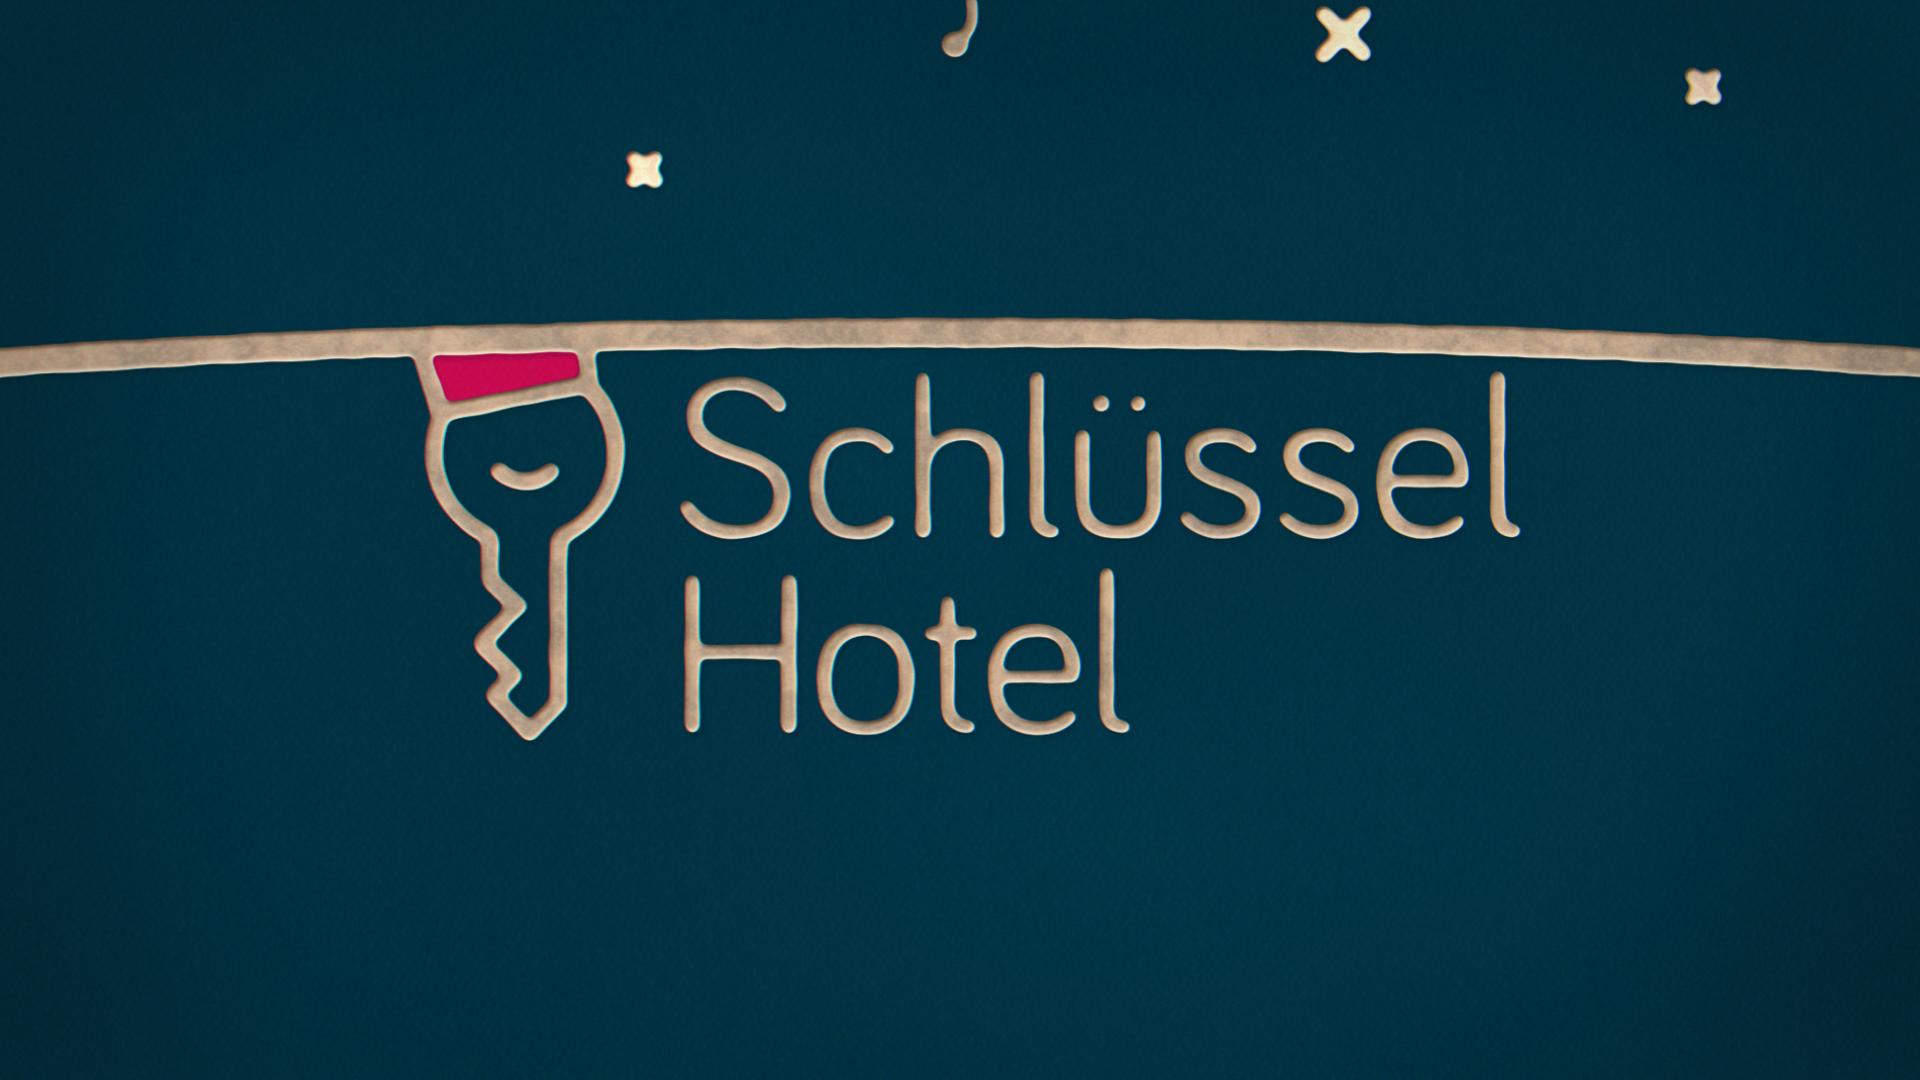 SchluesselHotel_Casefilm_07